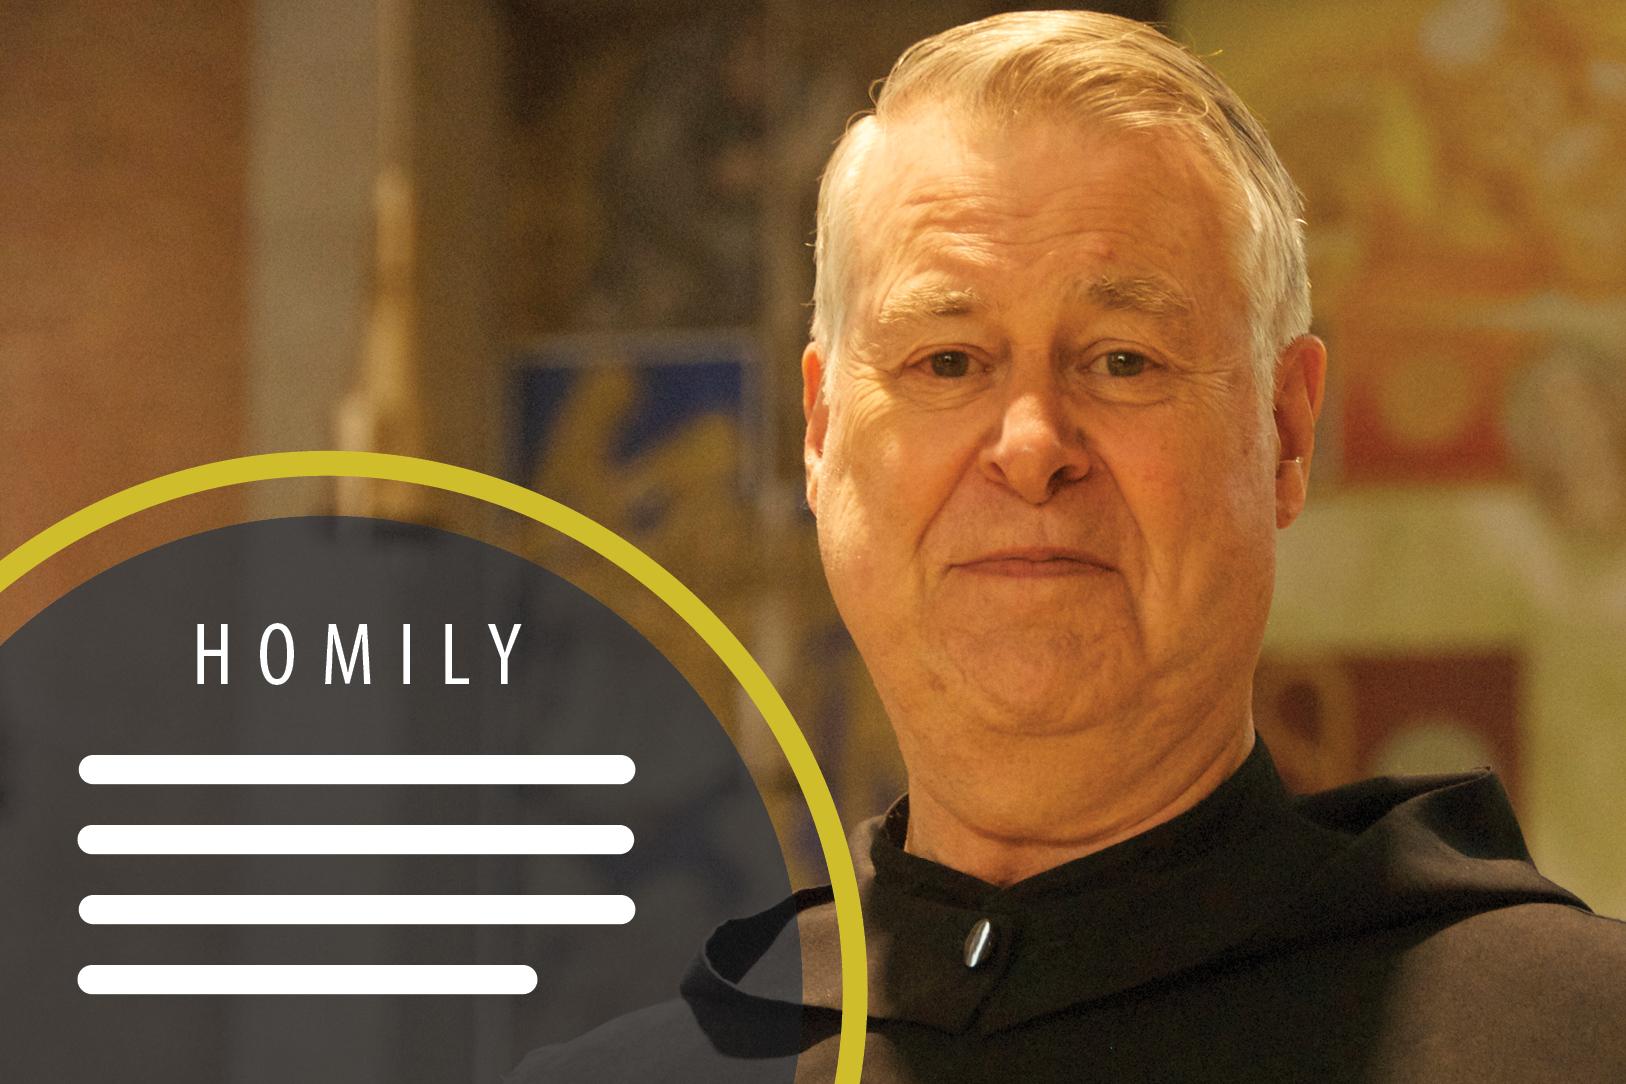 Fr. Matthew Habiger, OSB